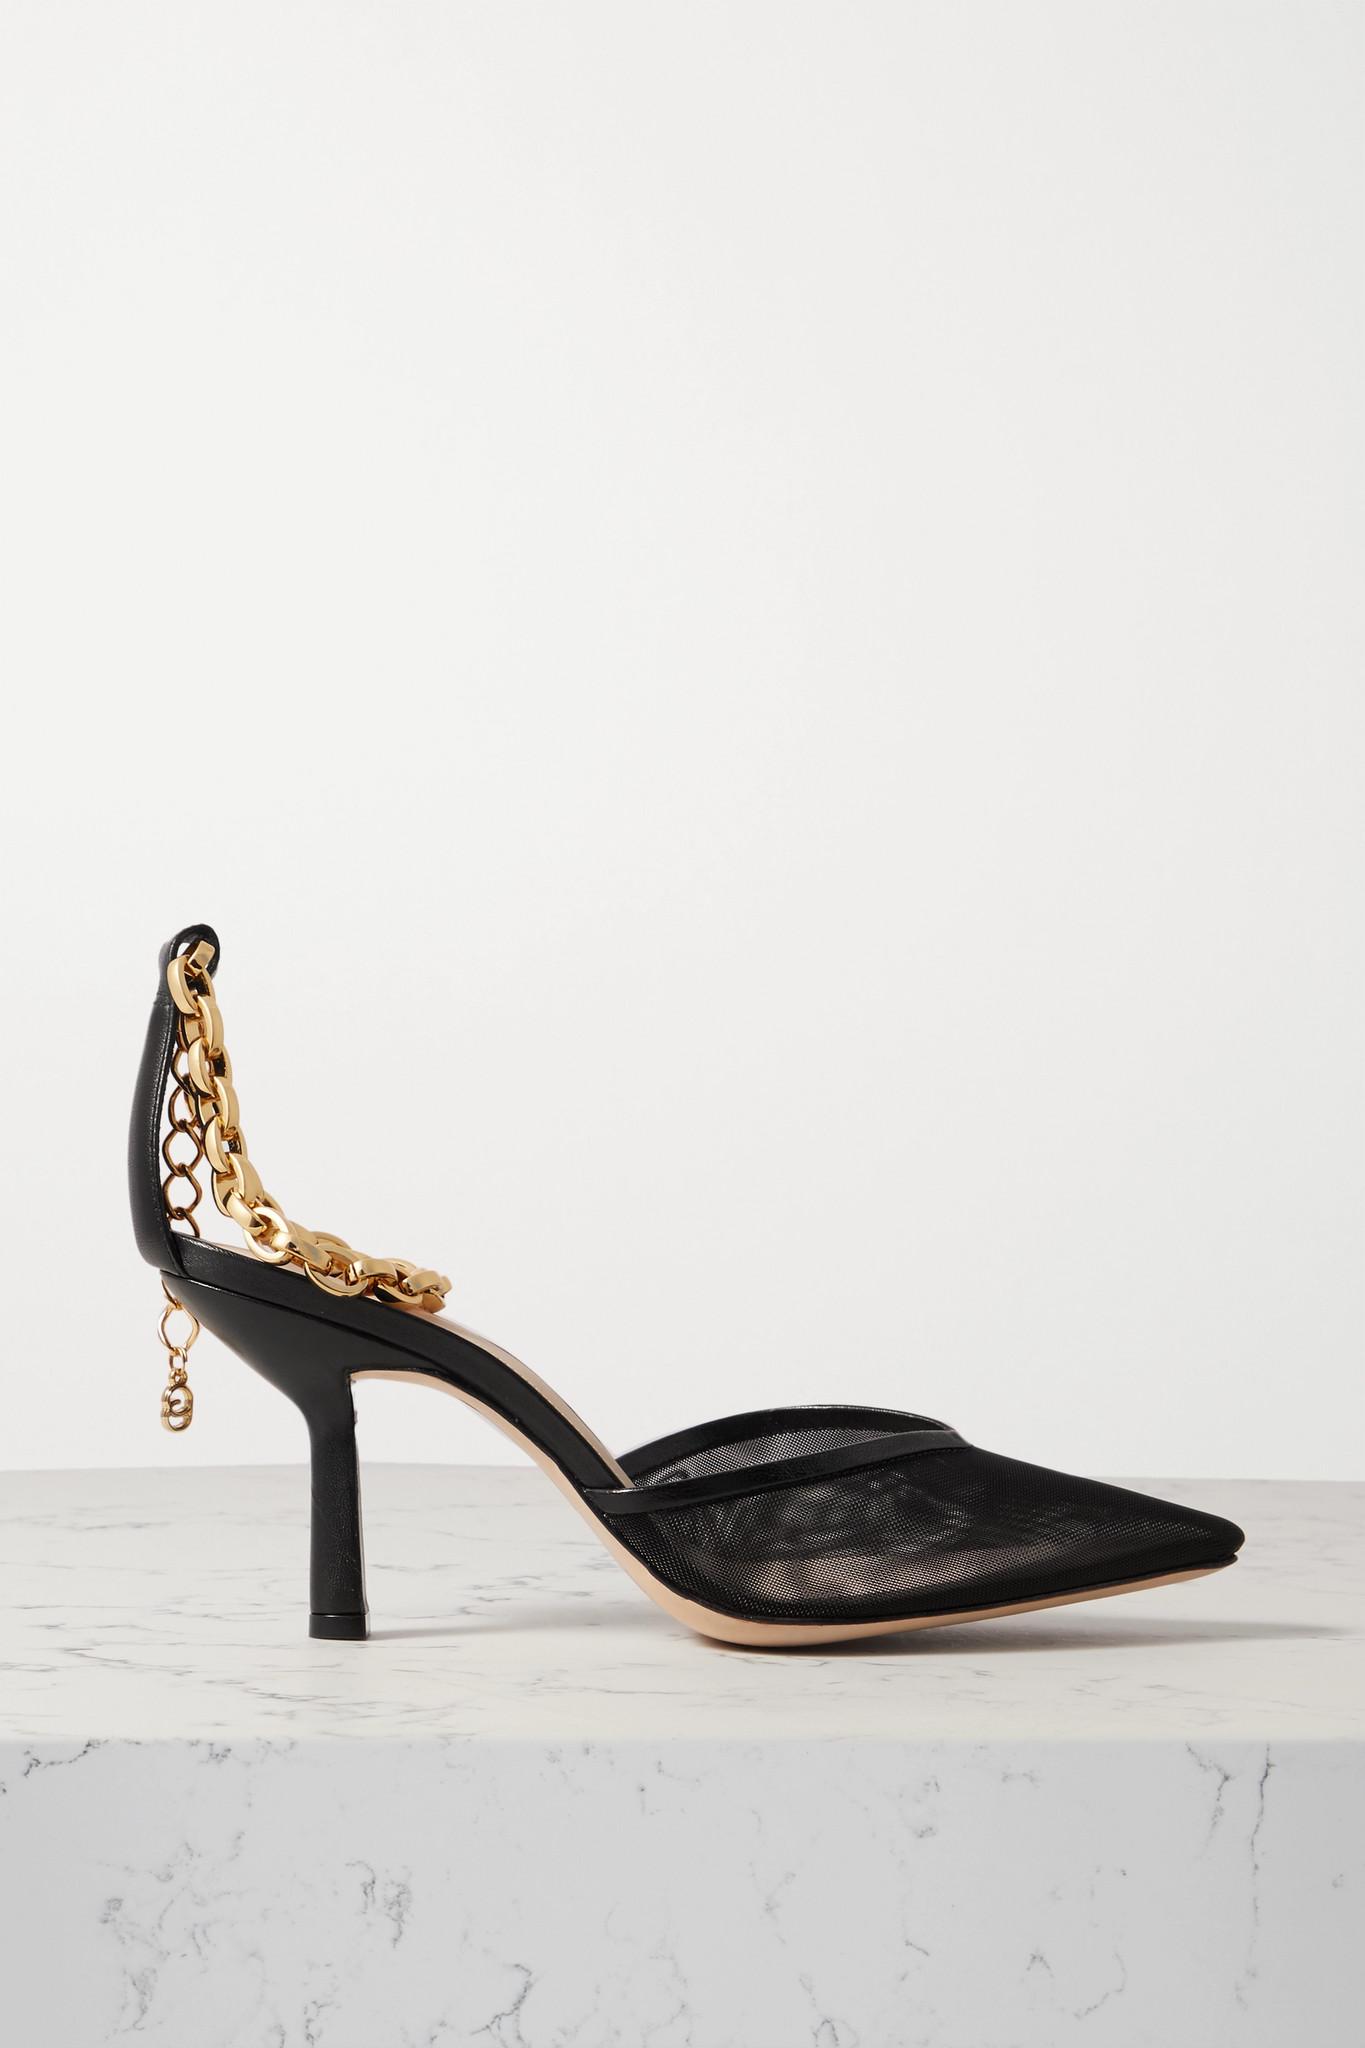 PORTE & PAIRE - 链条缀饰网布皮革高跟鞋 - 黑色 - IT37.5